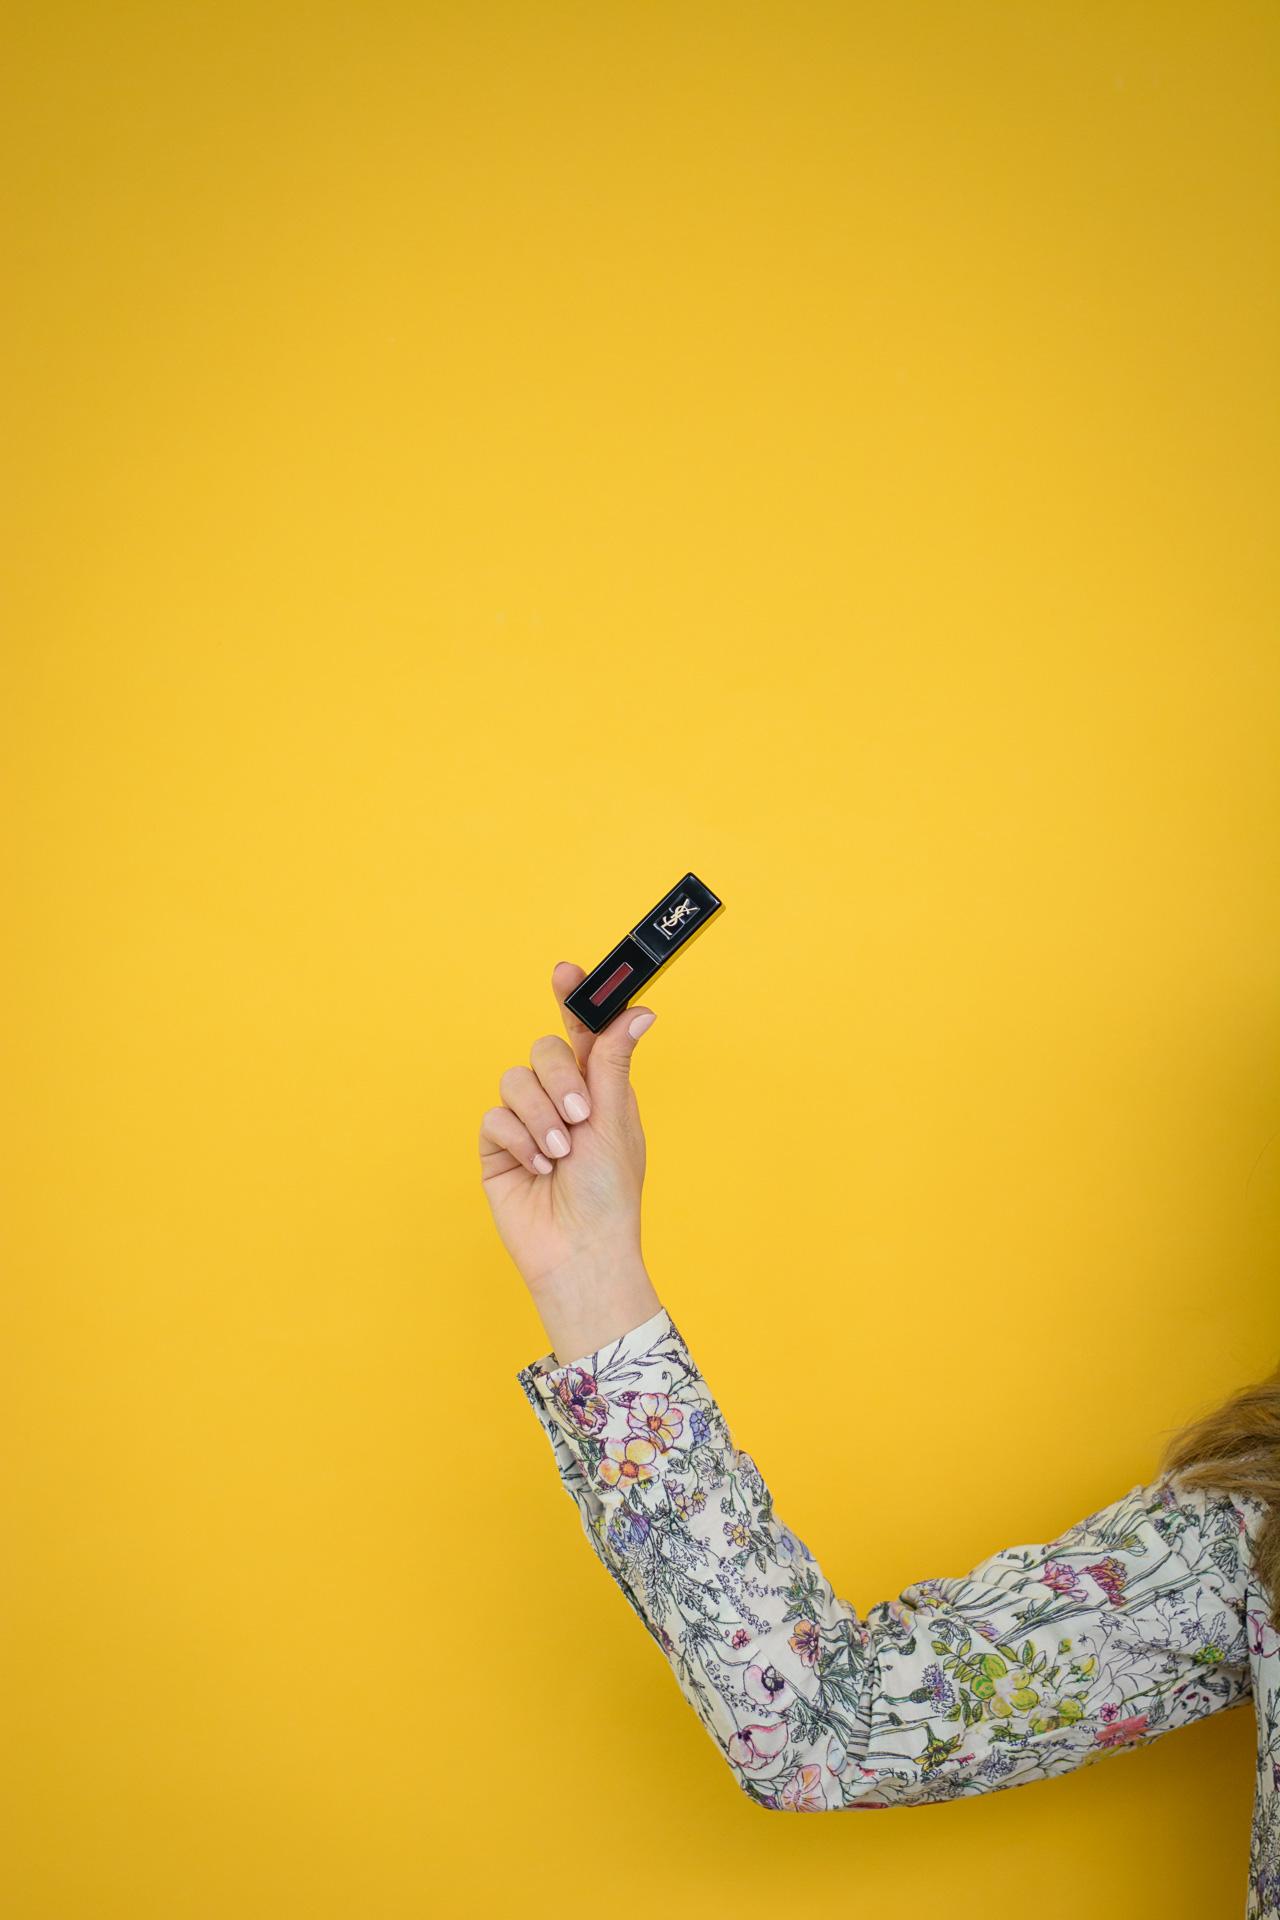 ysl vinyl cream lipstick